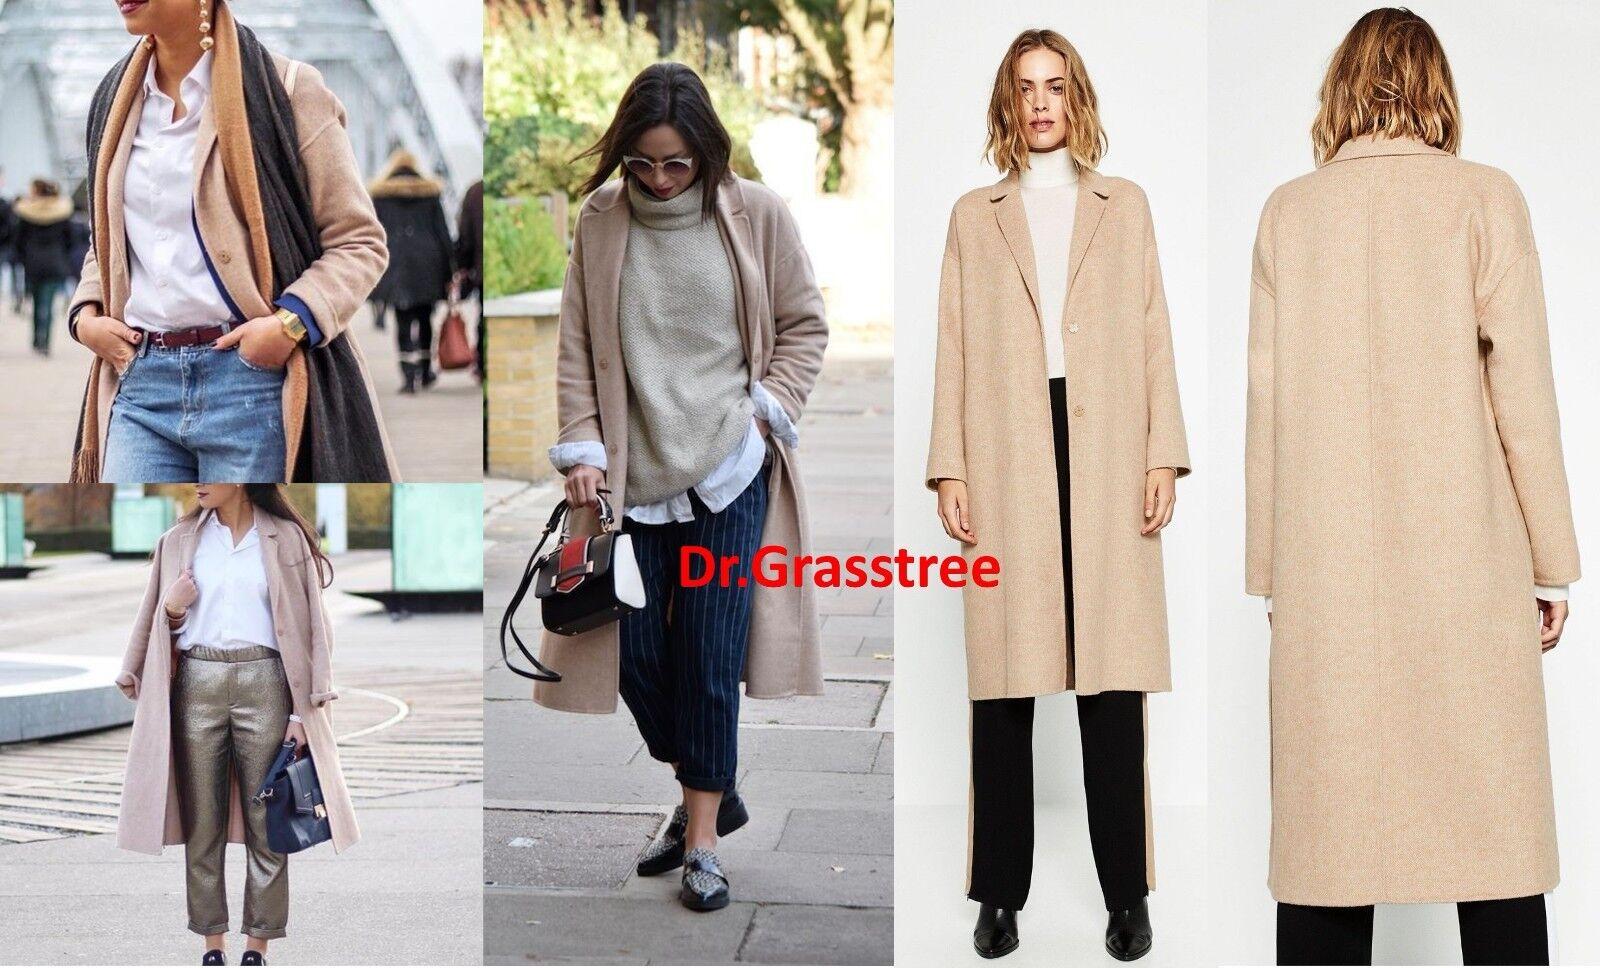 BNWT Zara Women HAND MADE WOOL LONG COAT Blogger Favorite 4070 222 sz M Rare